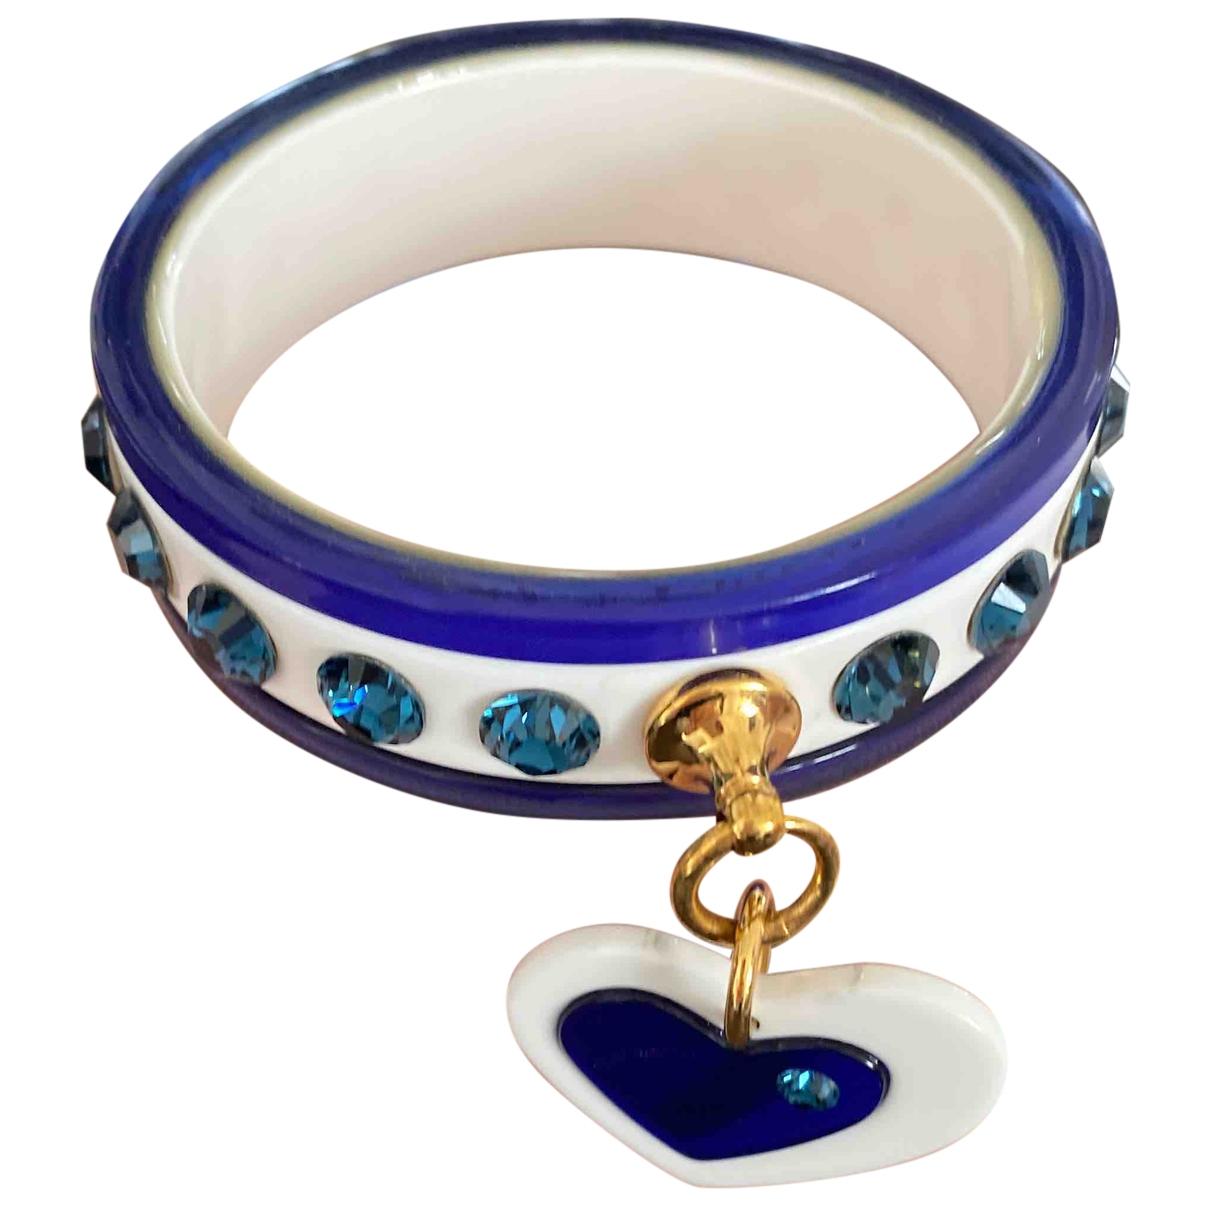 Miu Miu - Bracelet   pour femme - bleu